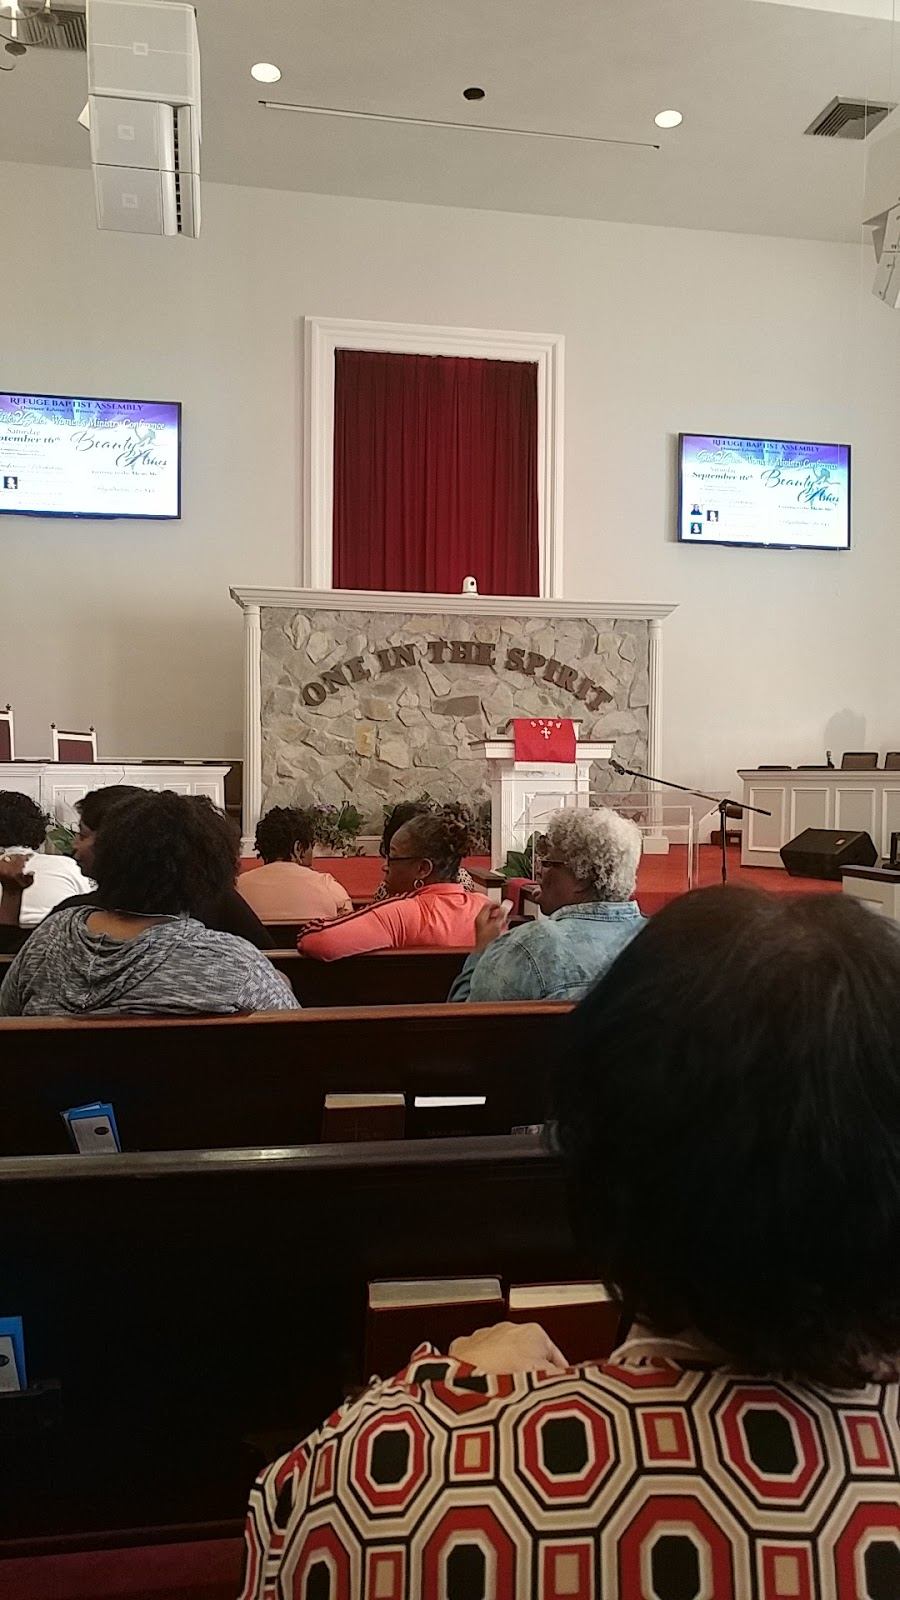 St. Stephen Baptist Church - church  | Photo 6 of 10 | Address: 5757 Temple Hill Rd, Camp Springs, MD 20748, USA | Phone: (301) 899-8885